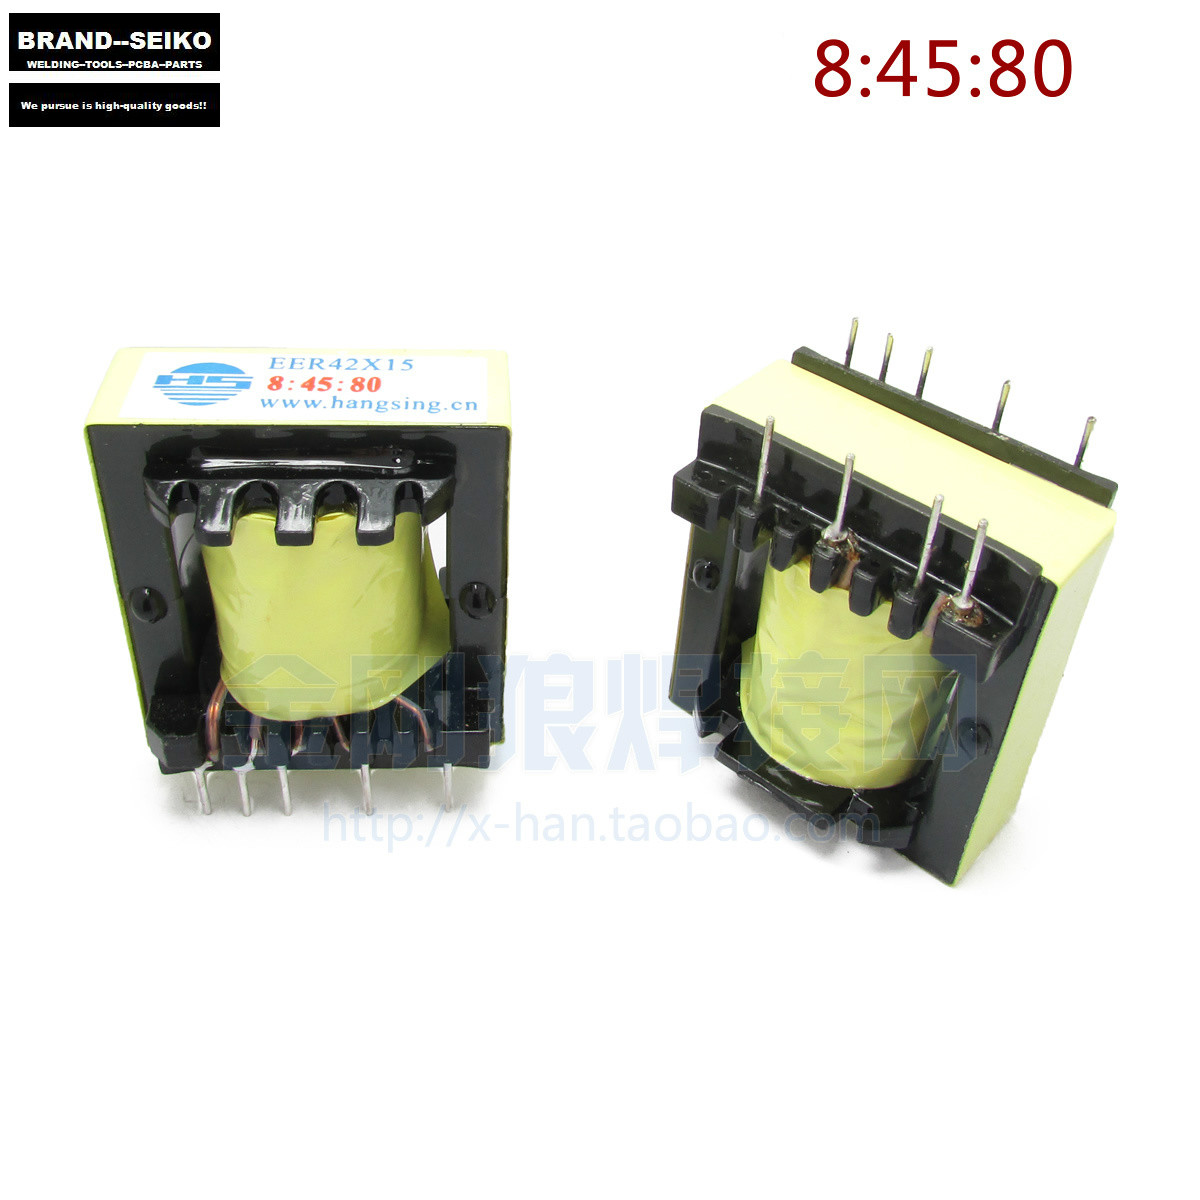 Inverter Welding Machine Board Upper Plate Ct312 Ct416 Three Circuit Arc Transformer Power Controller 2pcs Lot Argon High Voltage Ignition 845